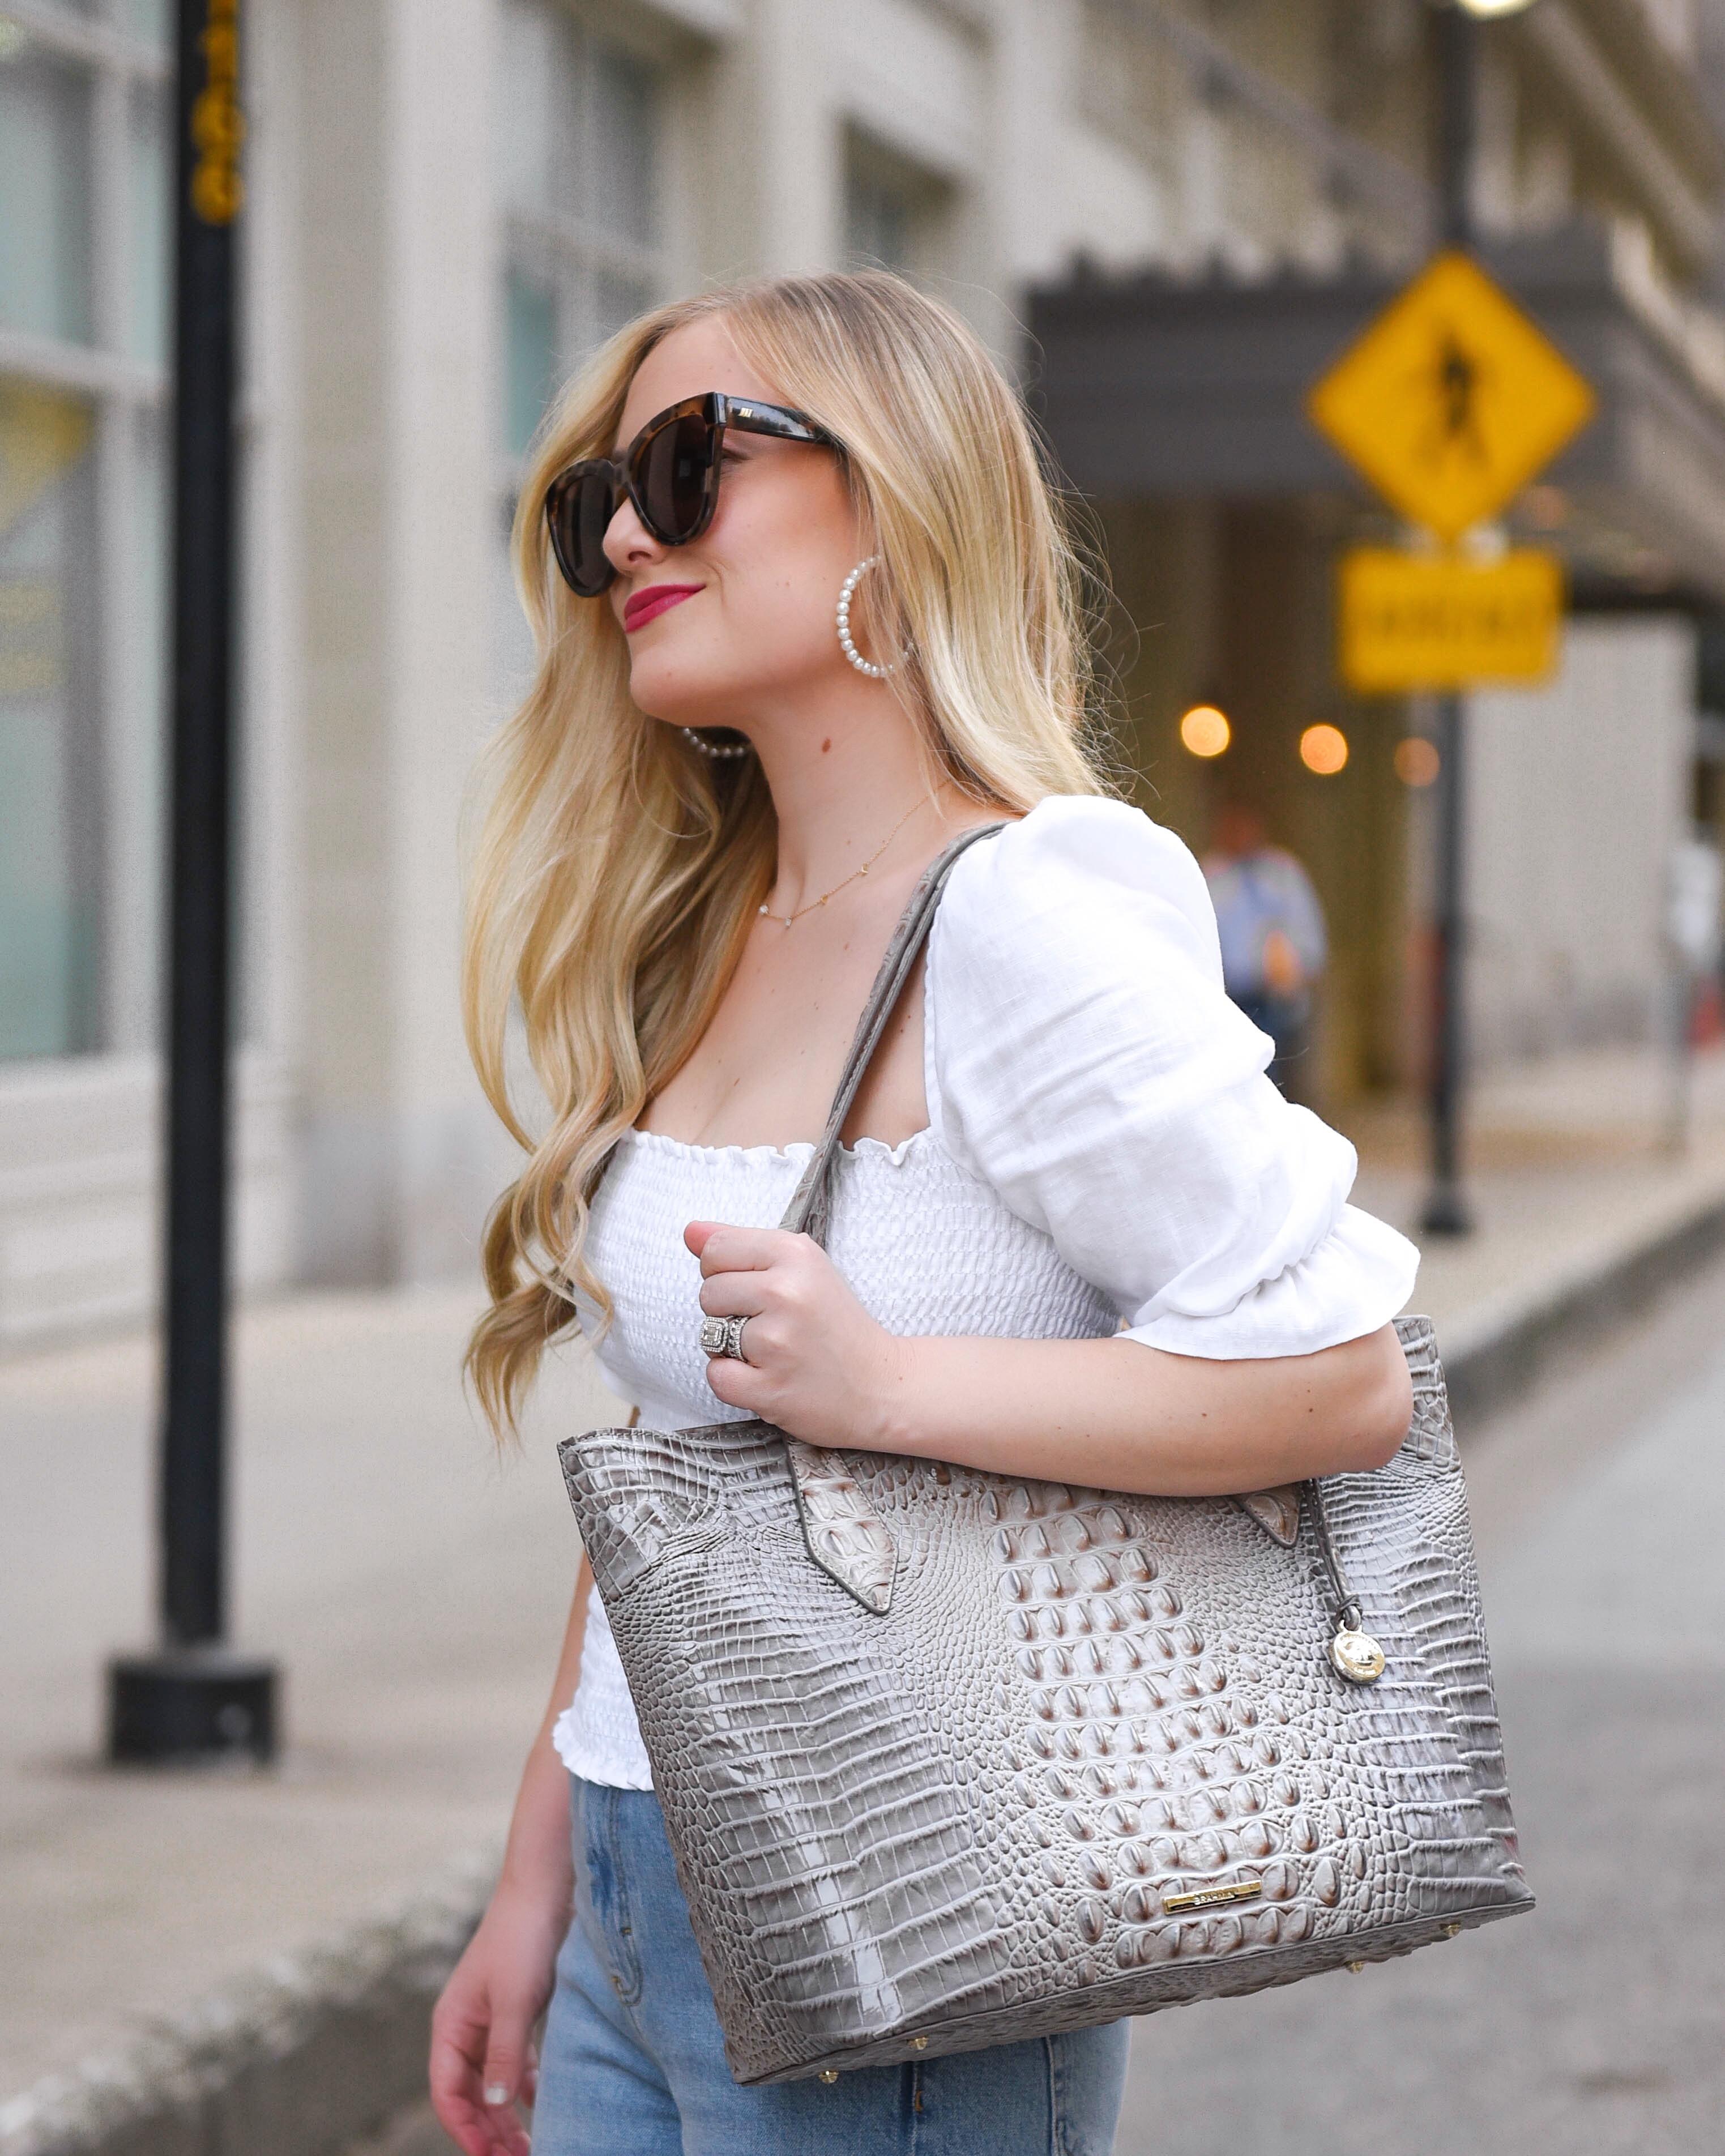 Lo-Murphy-Brahmin-Tote-Bag-Dallas-Blogger-Designer-Handbag-Leather-Tote